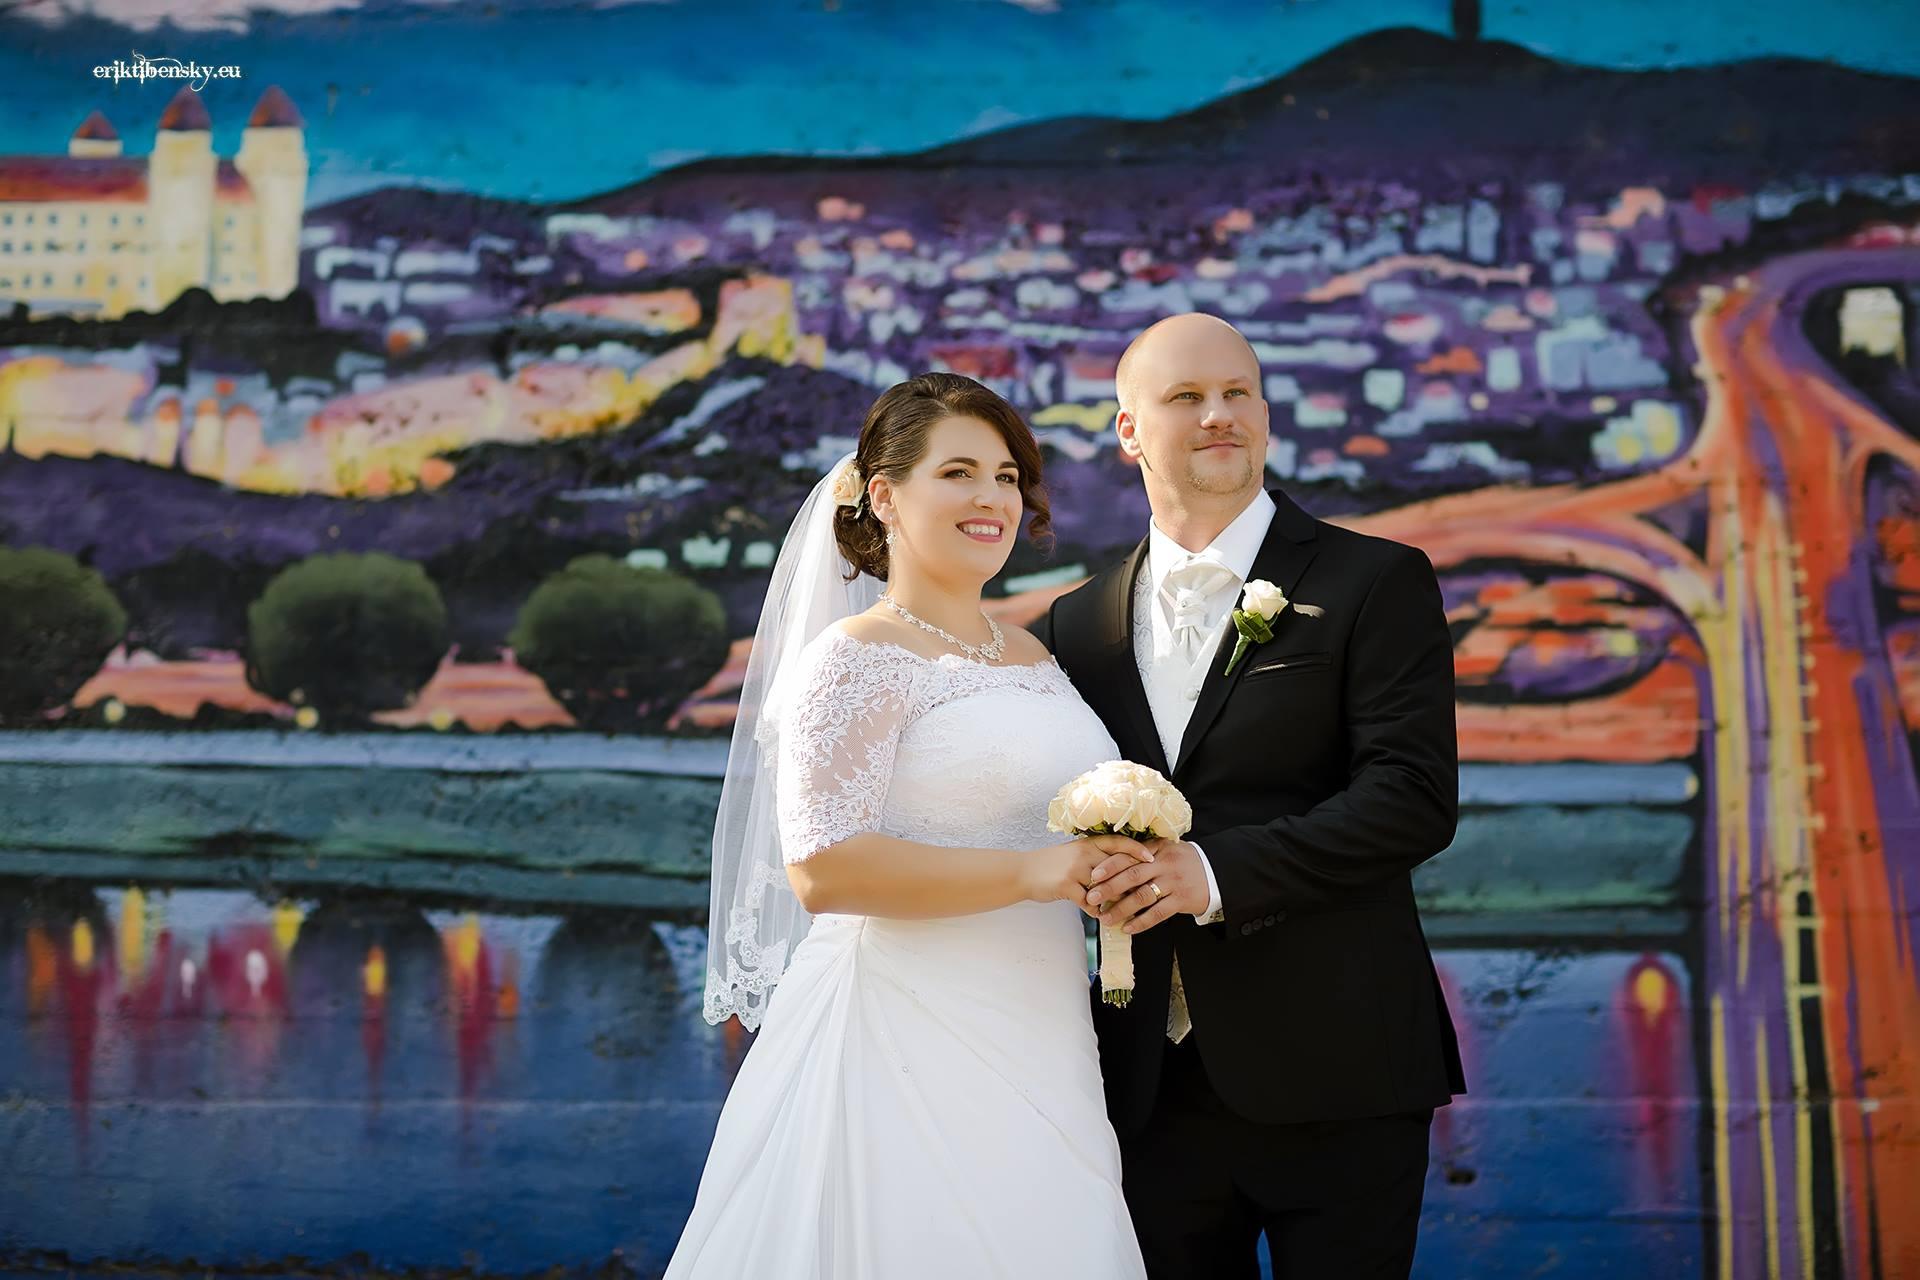 eriktibensky-eu-svadobny-fotograf-wedding-photographer-3107